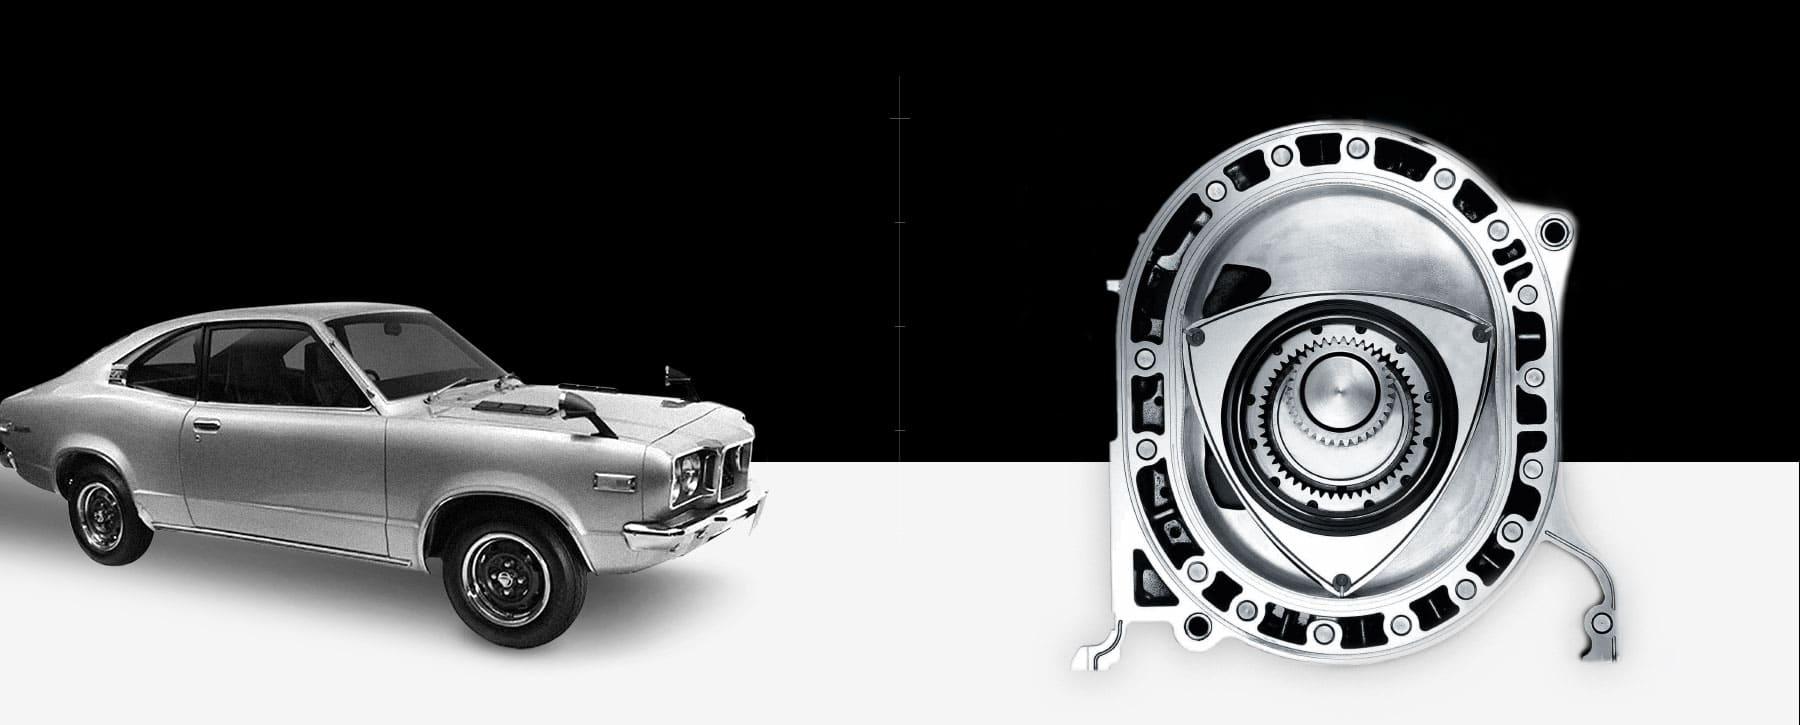 Historia de Mazda - Primer motor rotativo